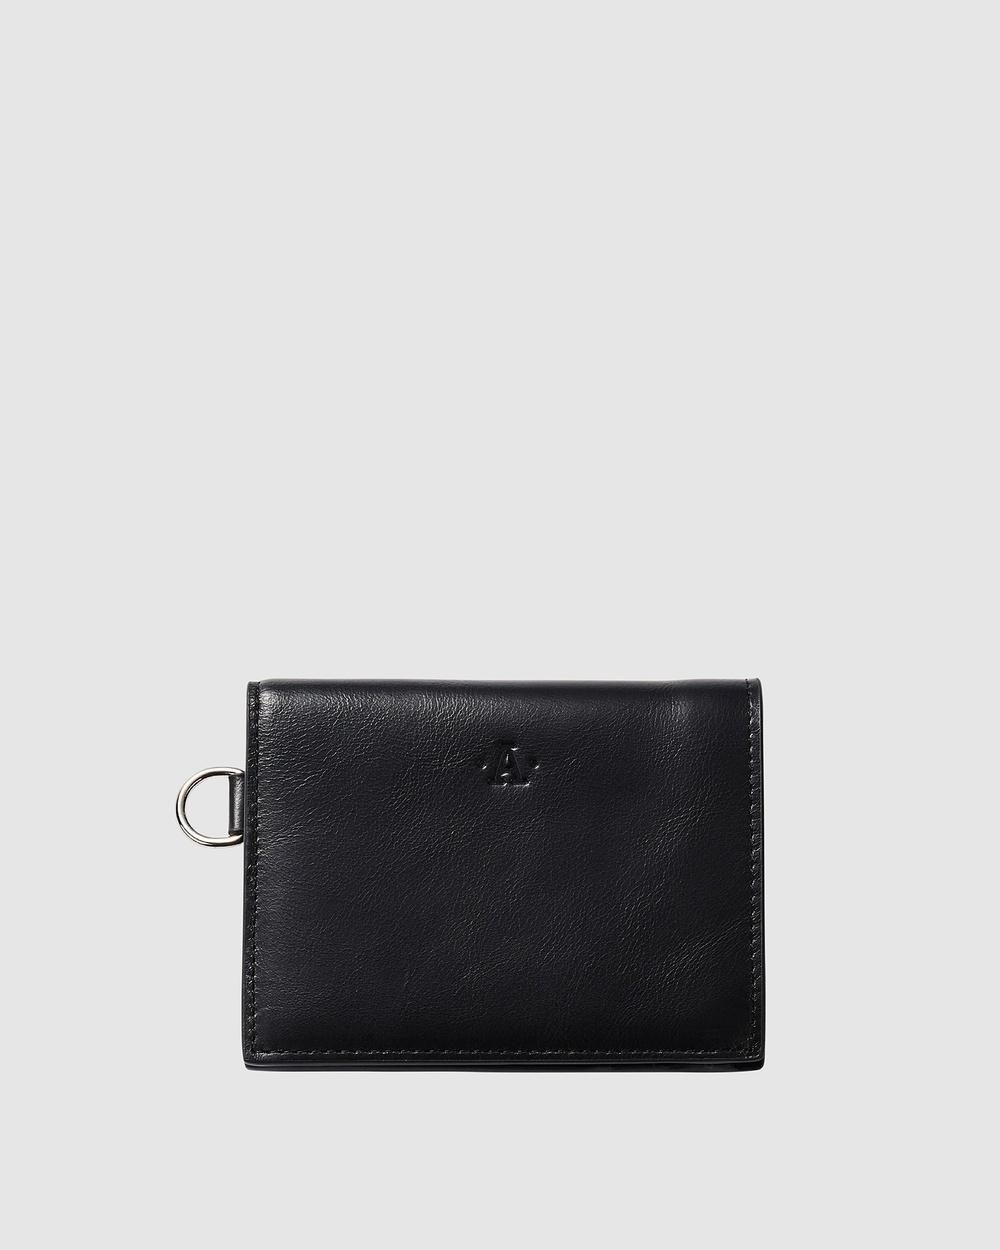 Atlas Lifestyle Co Wallet 04 Wallets Black